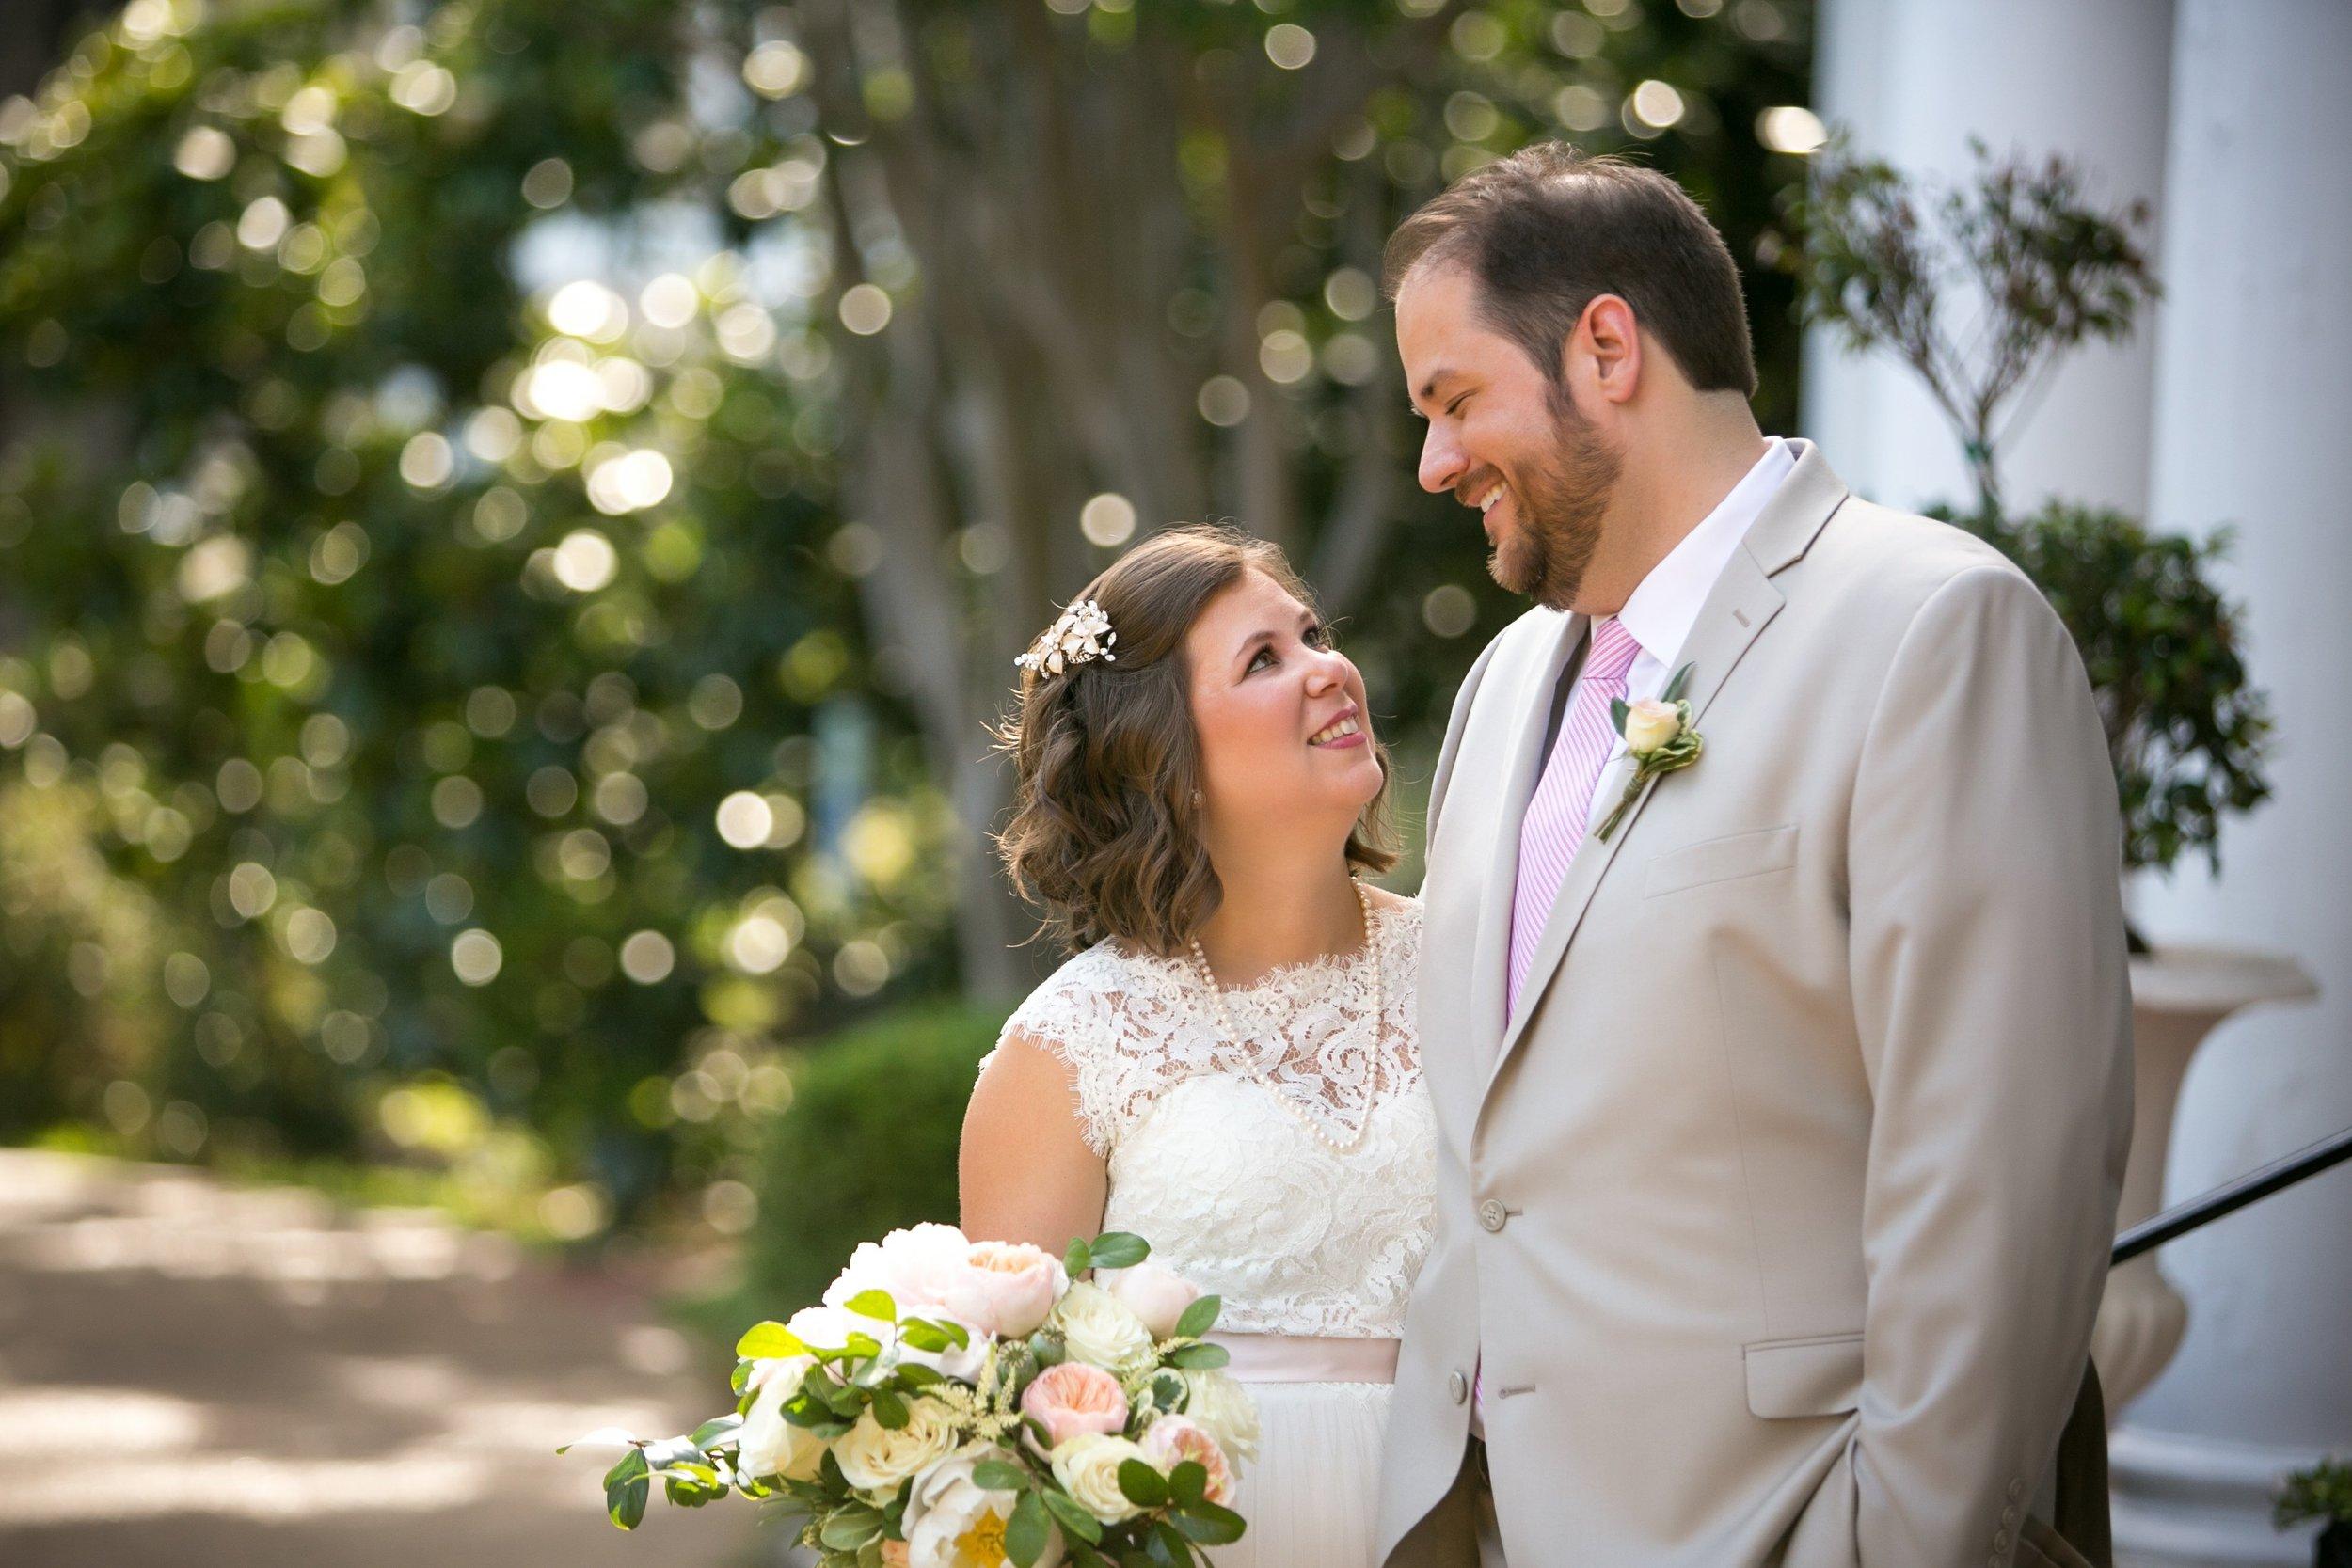 230-H1331-Anzelmo-Dubose-Wedding.jpg